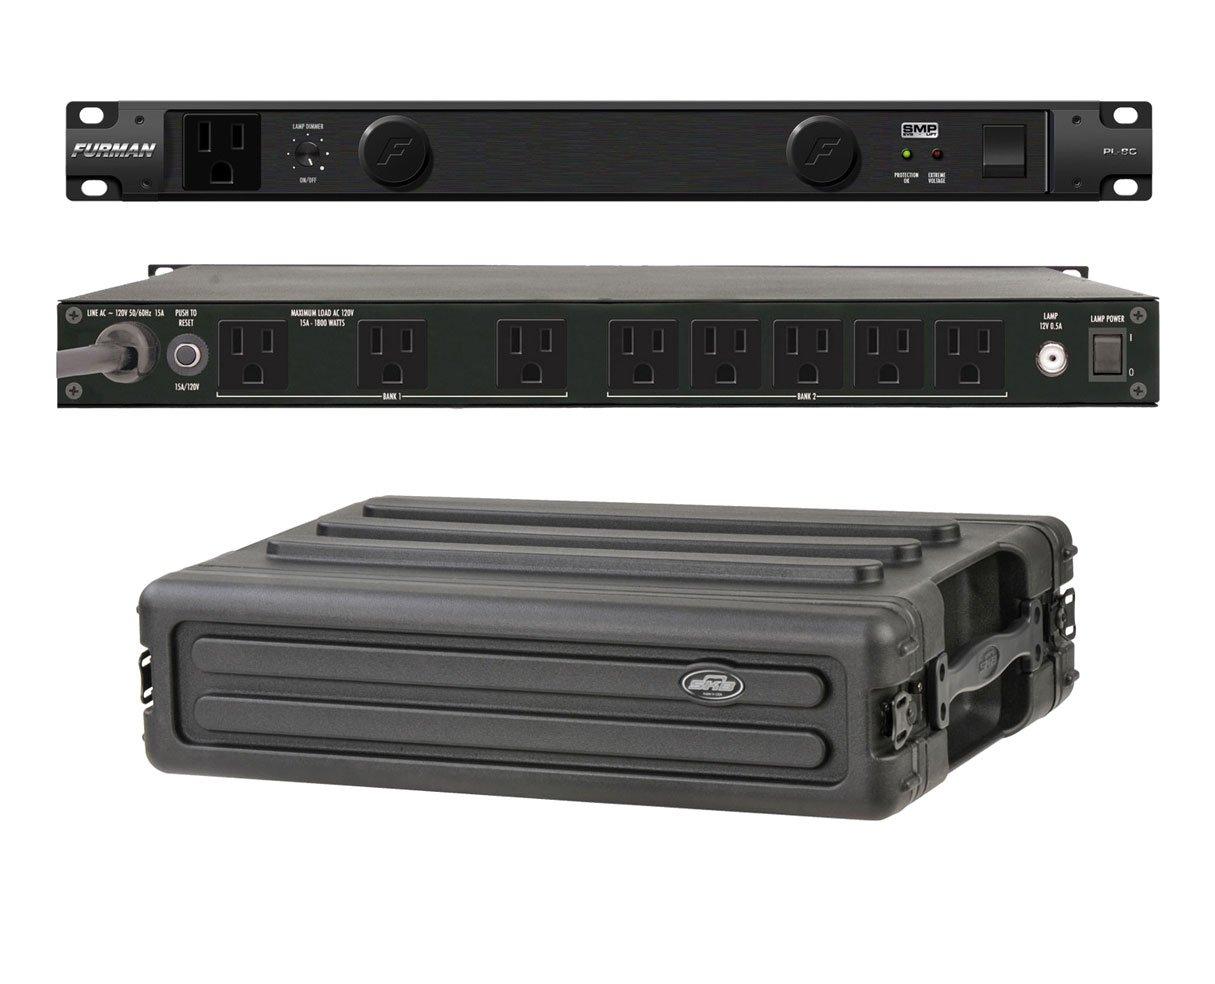 Furman PL-8 C Rack Mount Power Conditioner + SKB 1SKB-R2S 2U Shallow Rack